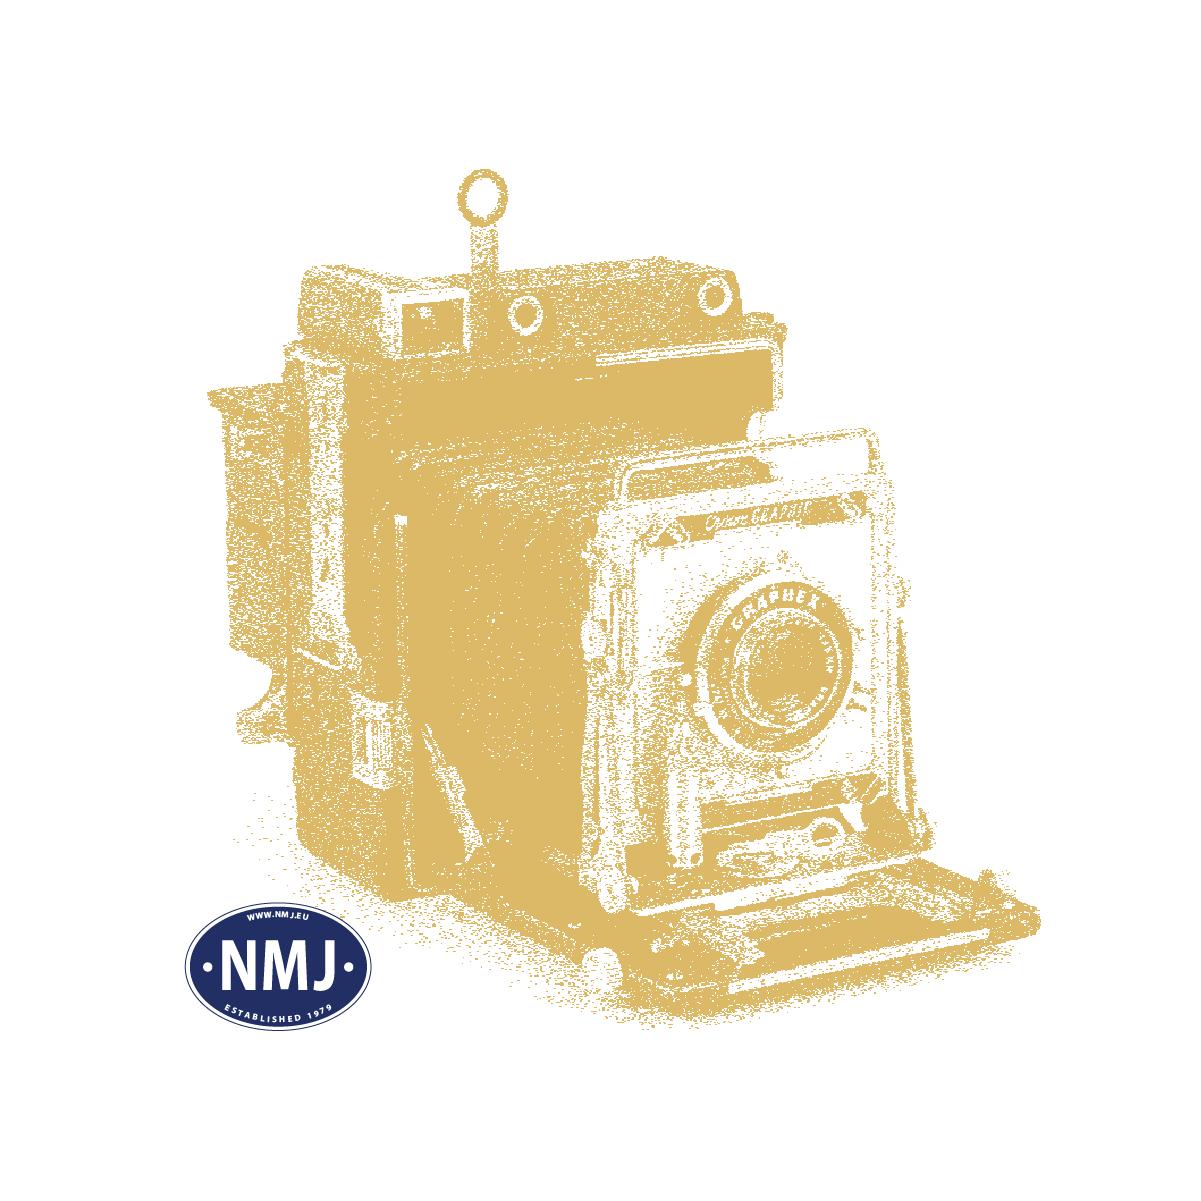 NMJT90210 - NMJ Topline MAV M61.013, DCC m/ Lyd